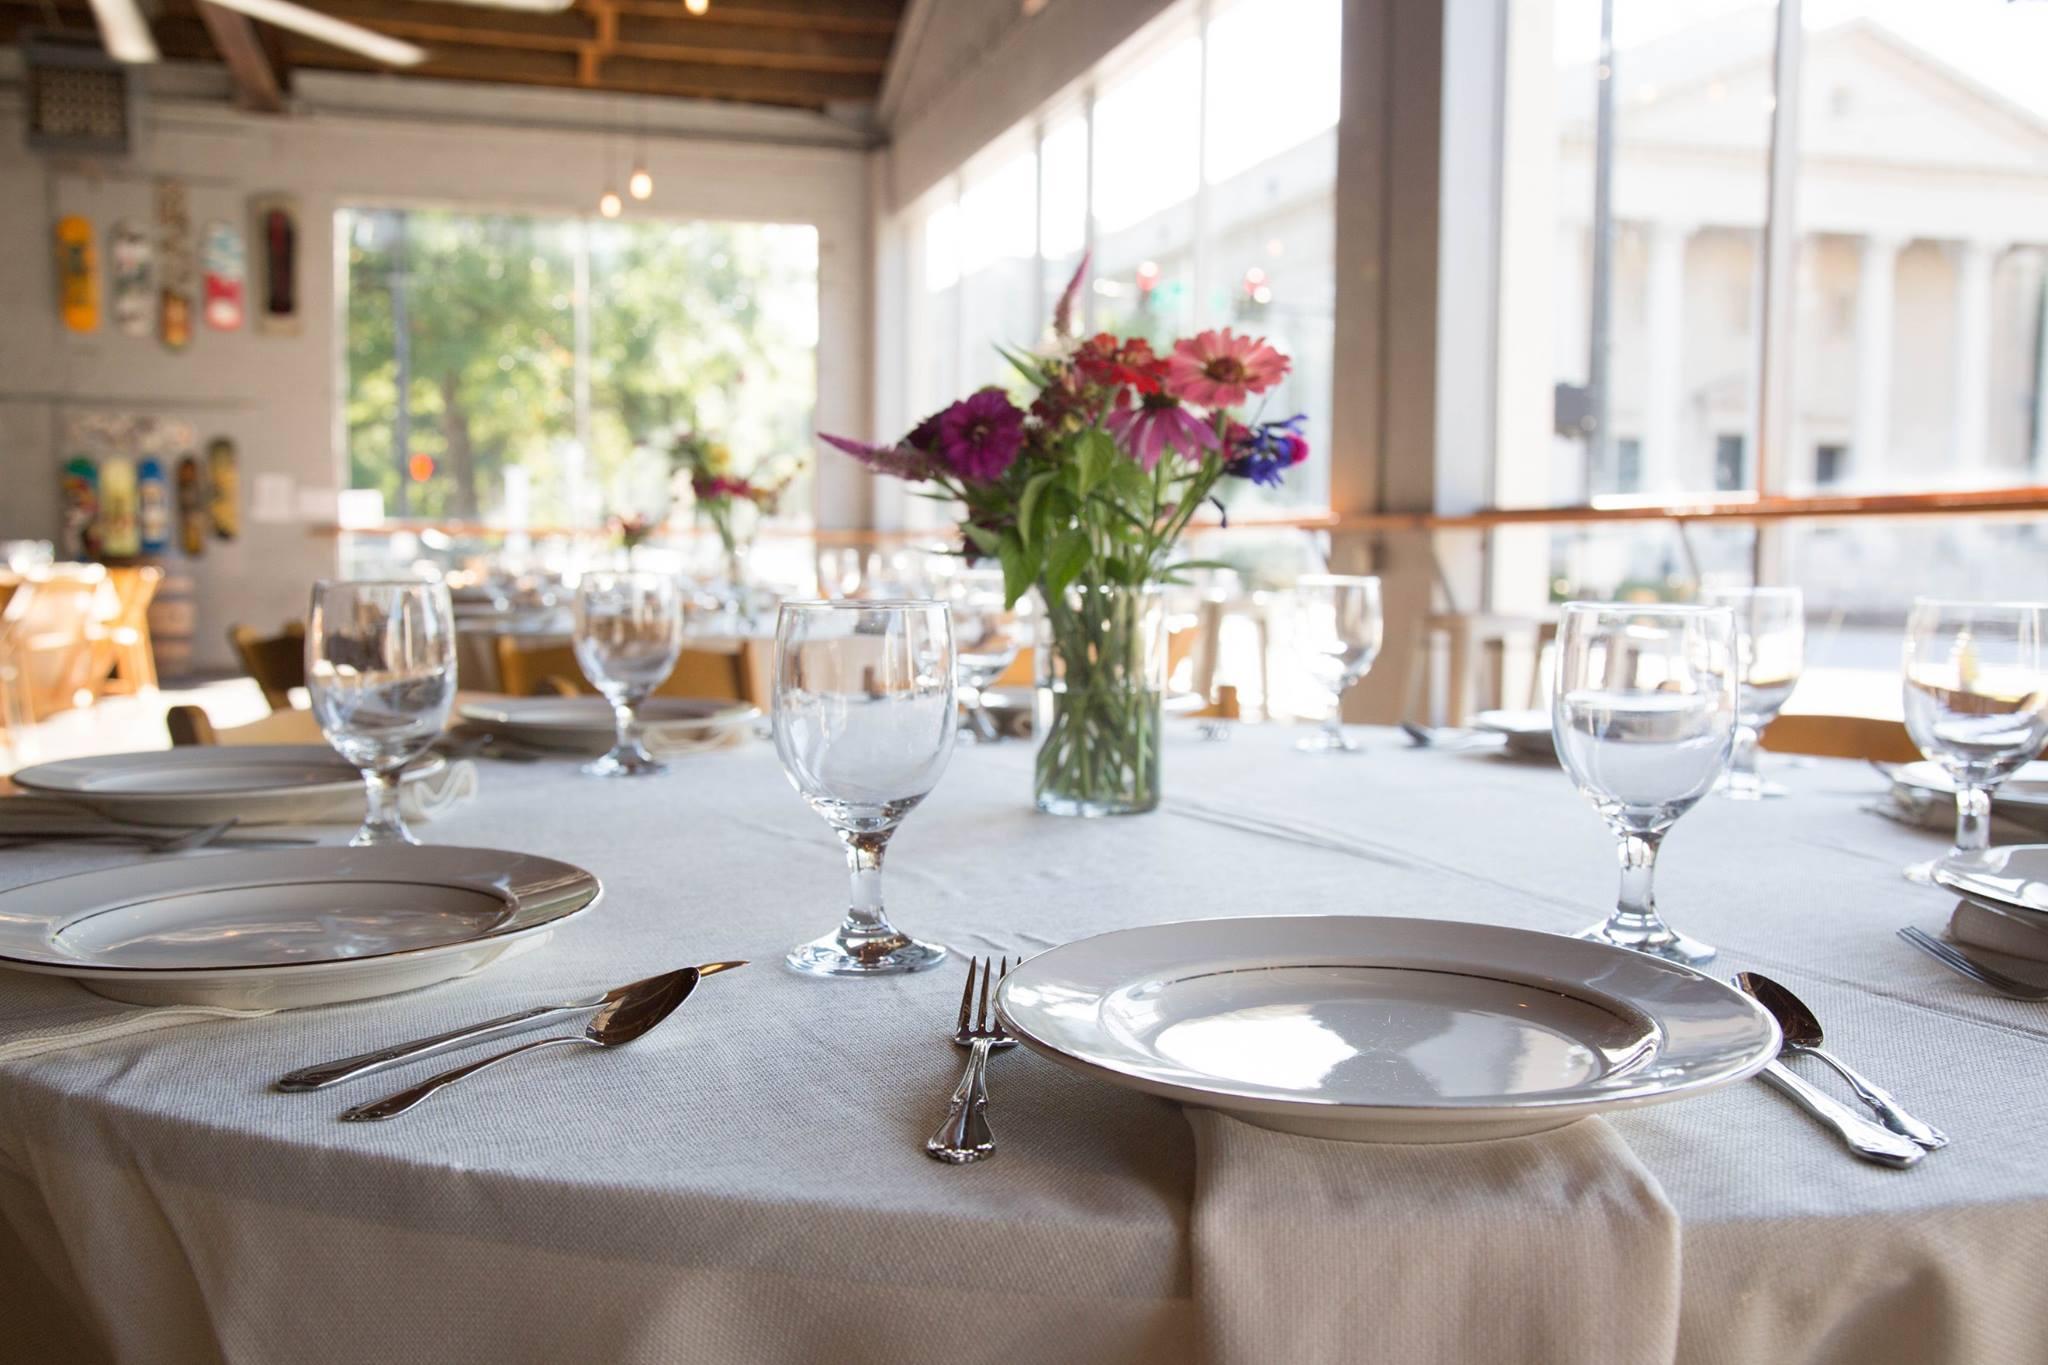 athens chef dinner u2013 table setting & athens chef dinner - table setting - Barrons Barrons